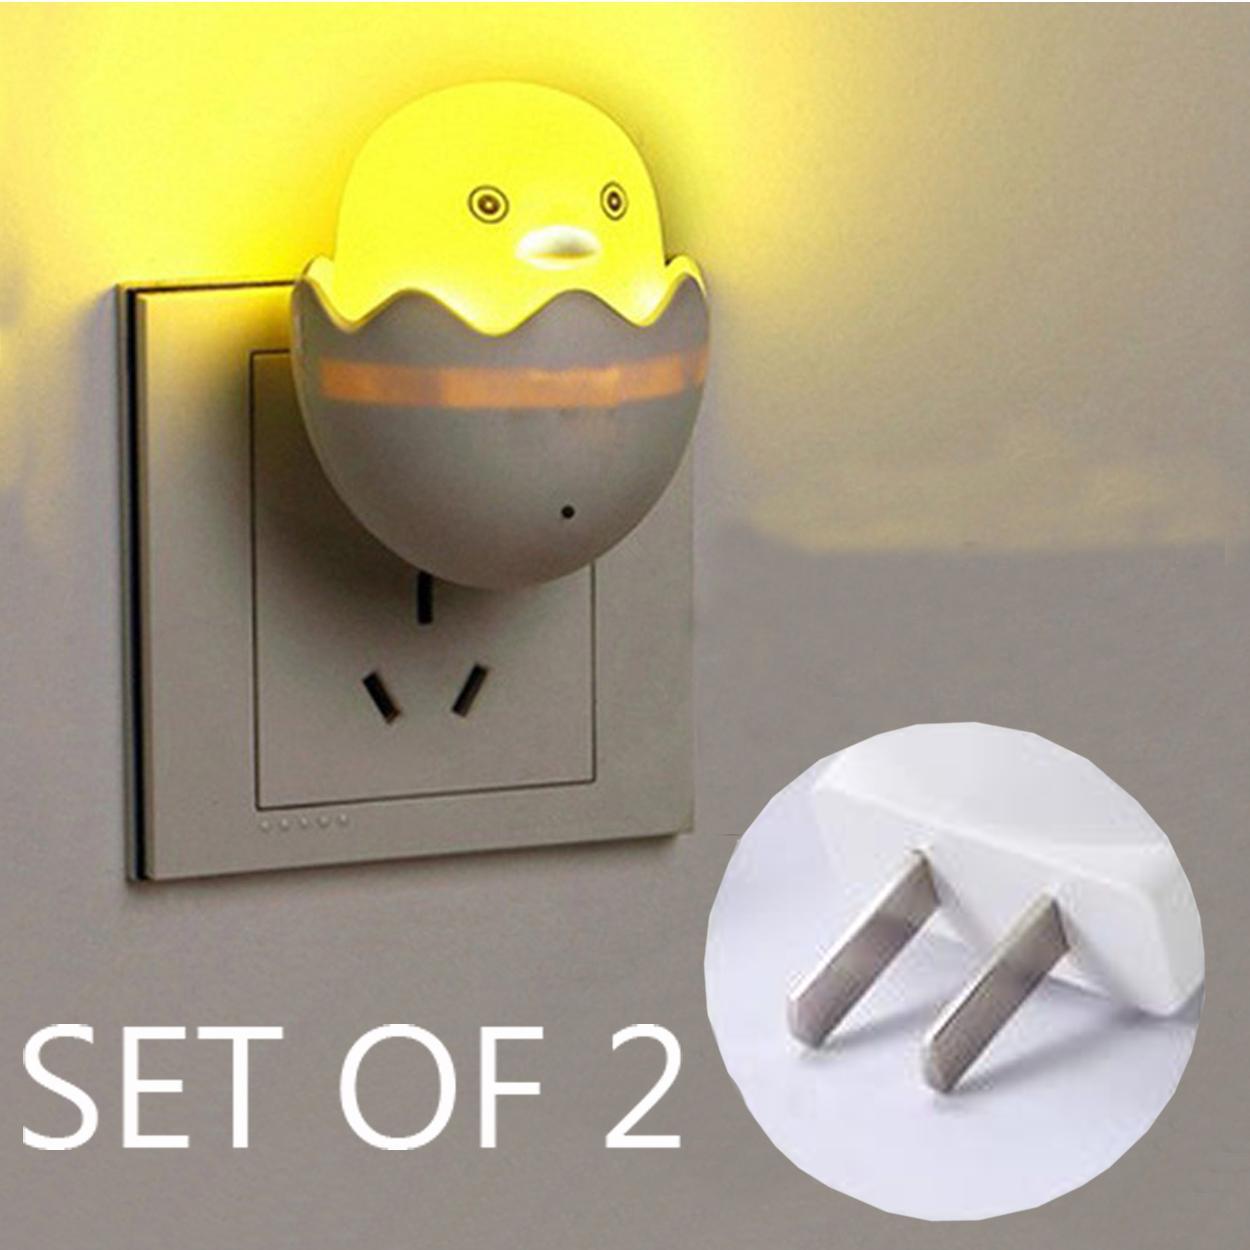 9ecb435011cd Set OF 2 Yellow Duck LED Night Light Sensor Control Bedroom Wall Lamp US  Plug